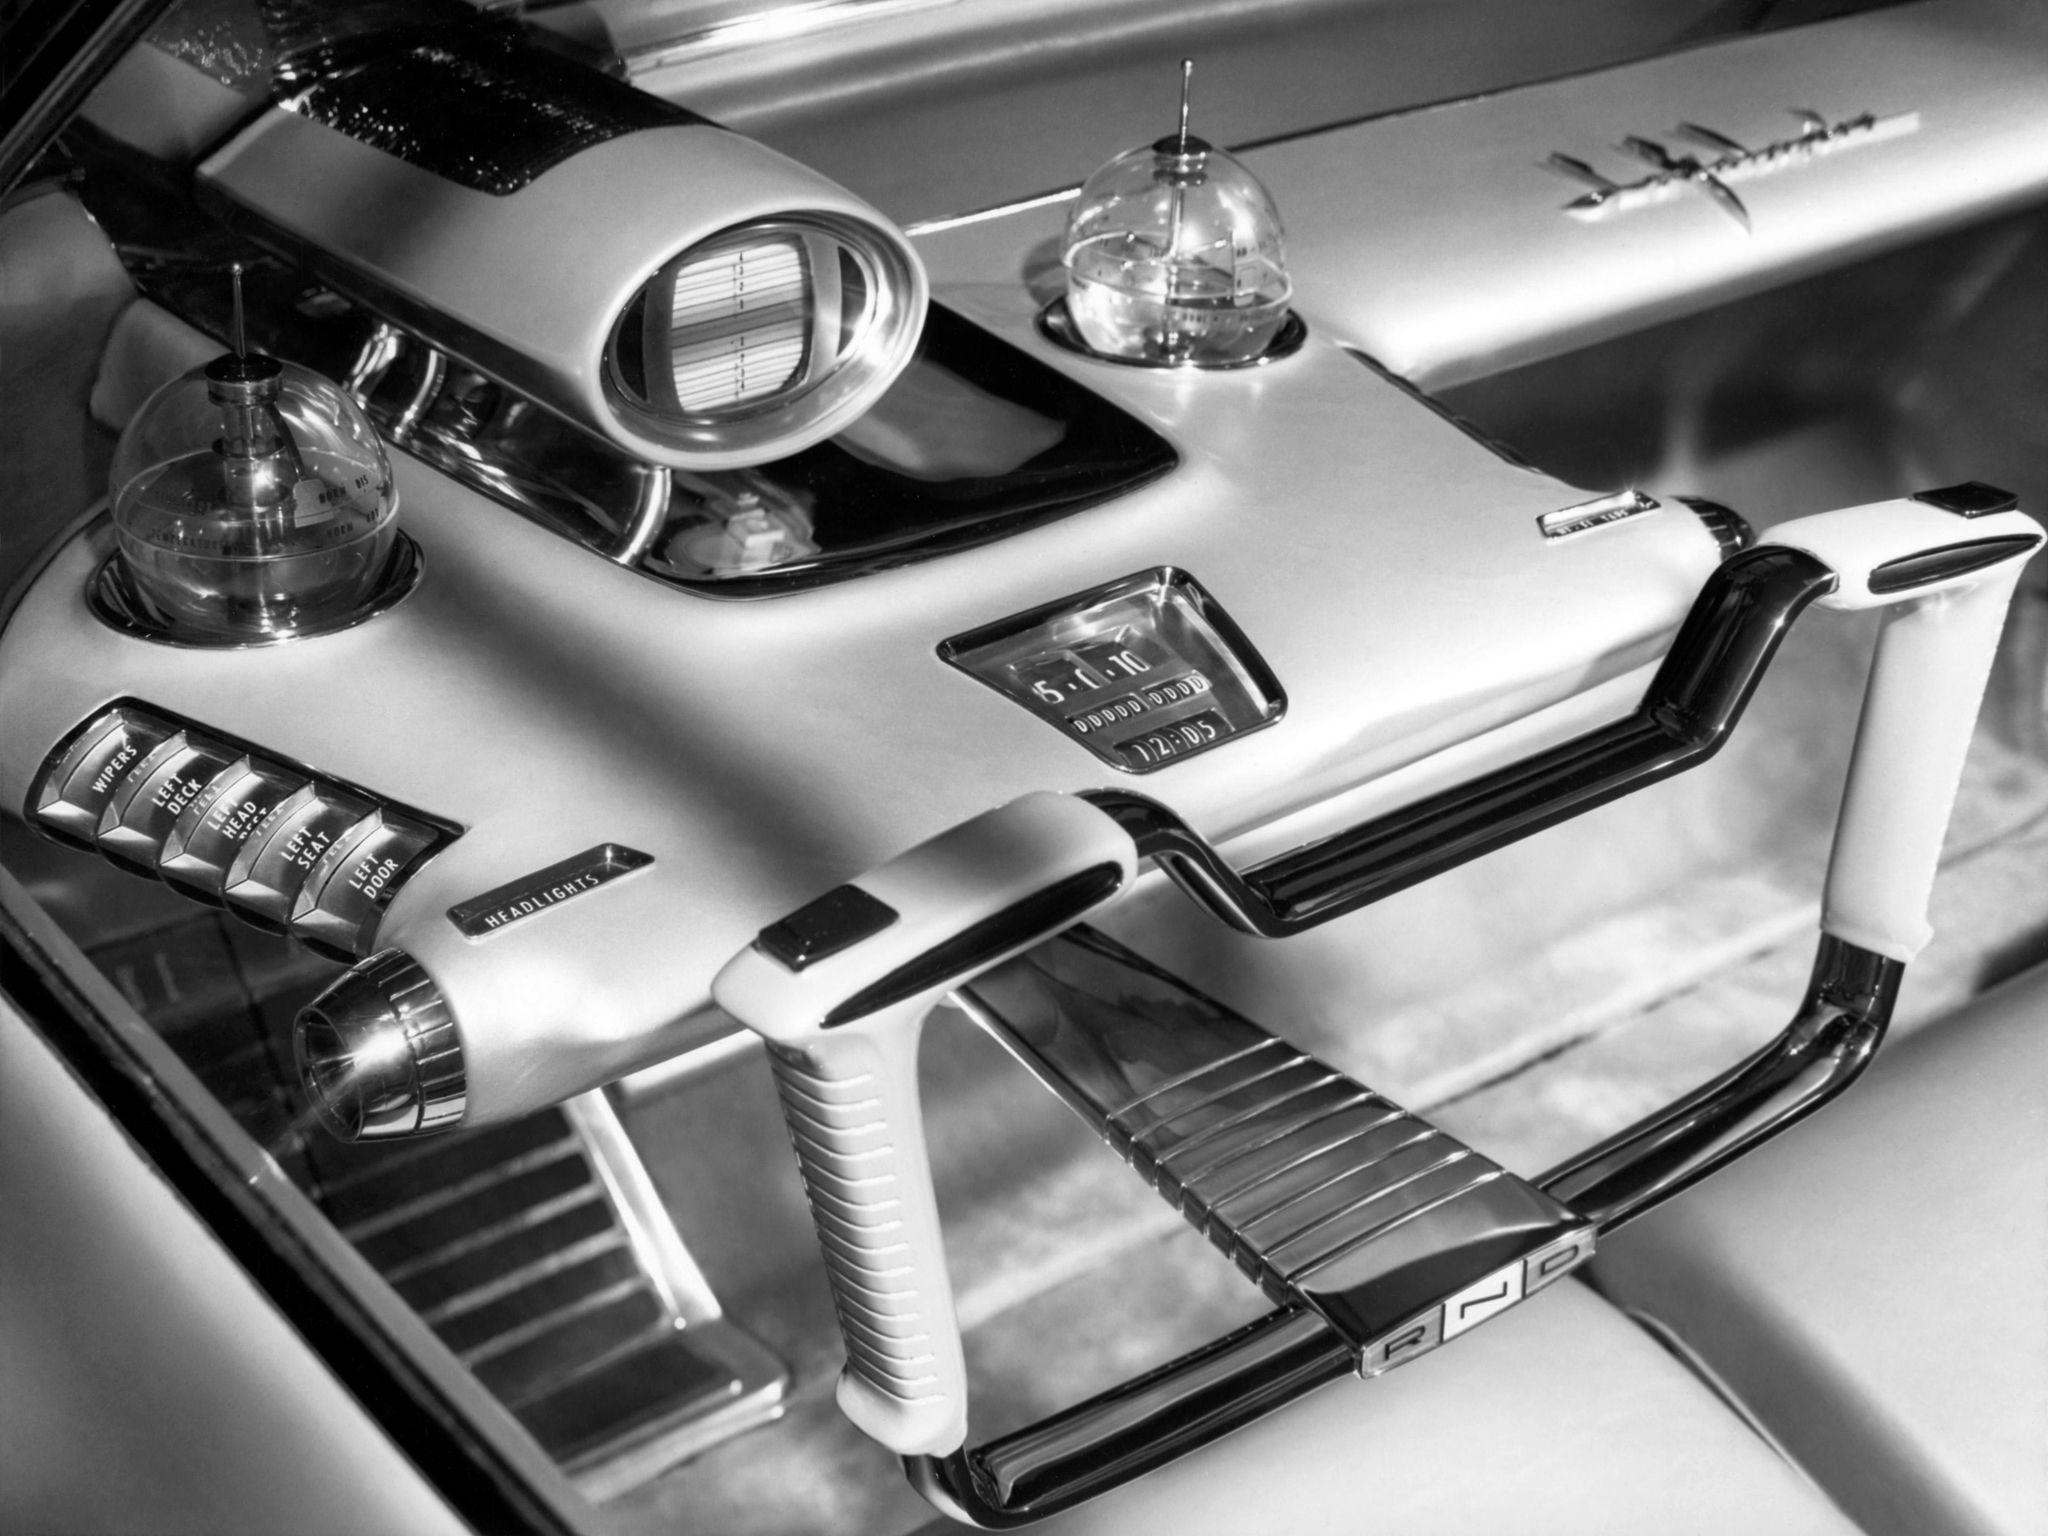 Ford La Galaxie Concept Car 1958 - Interior & Ford La Galaxie Concept Car 1958 - Interior | Kokpit Tasar?m? ... markmcfarlin.com